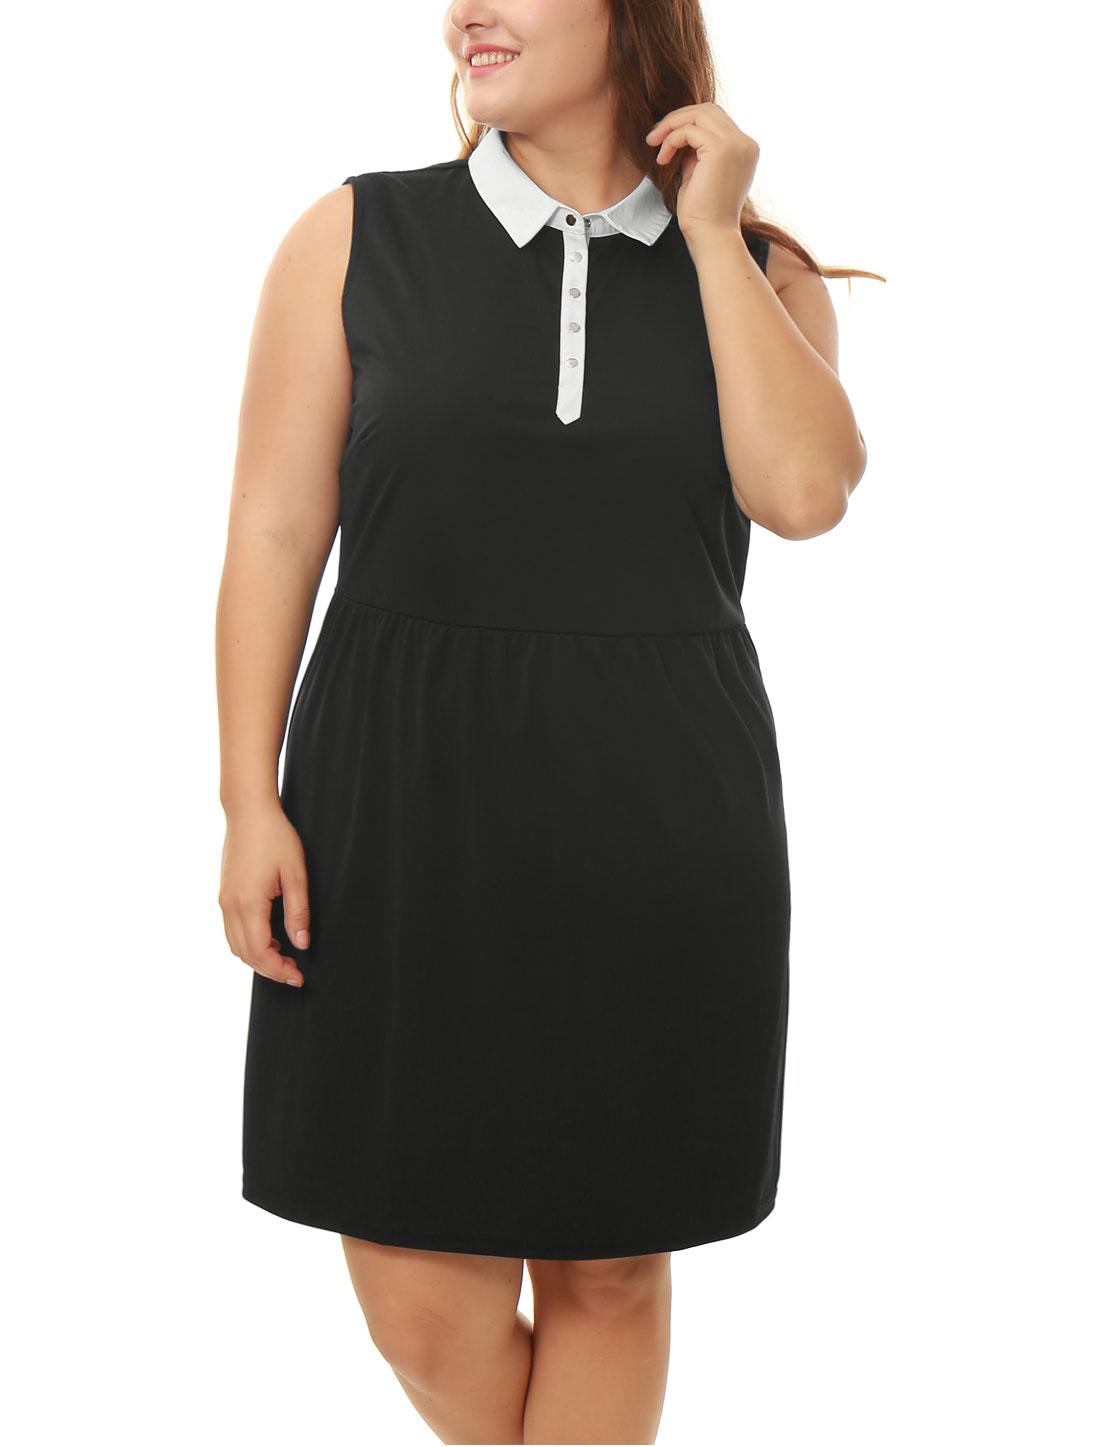 Women Plus Size Sleeveless Contrast-Collared A Line Dress Black 2X